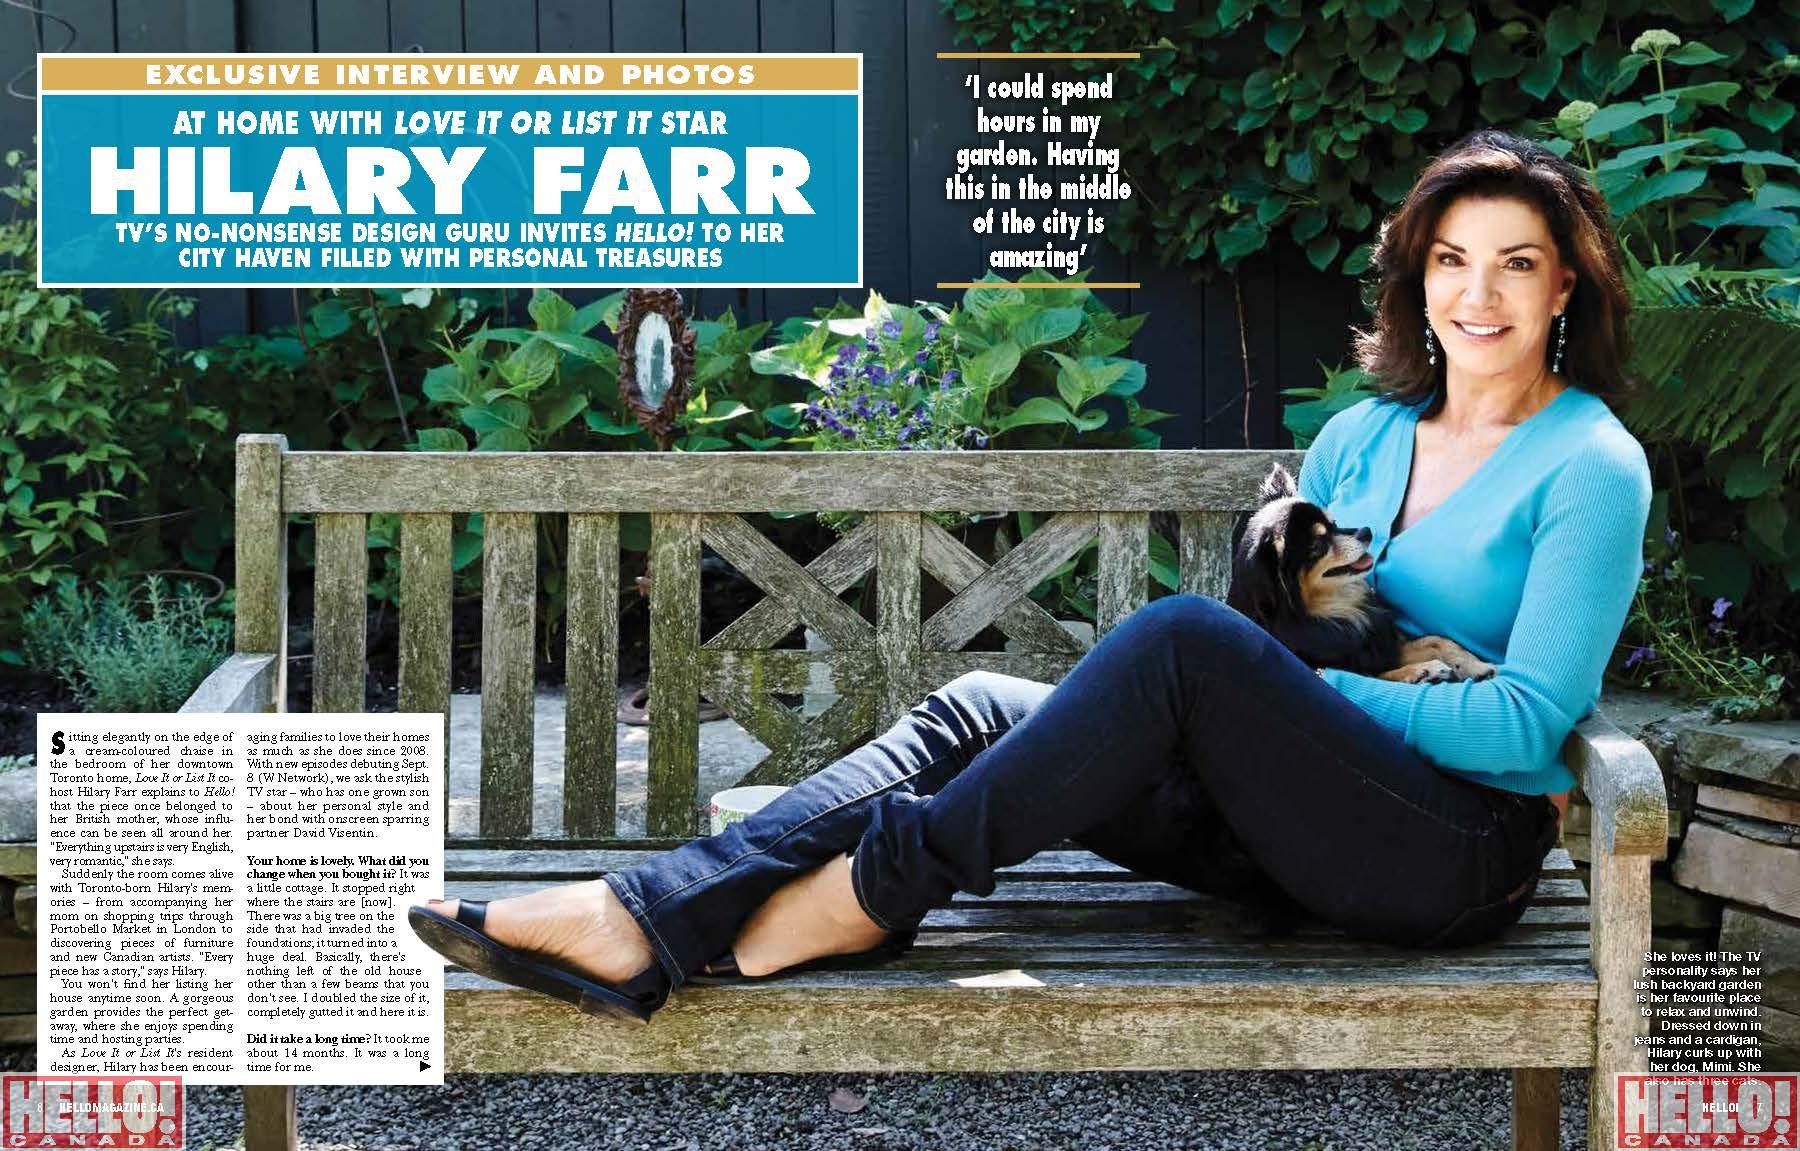 Hilary Farr event